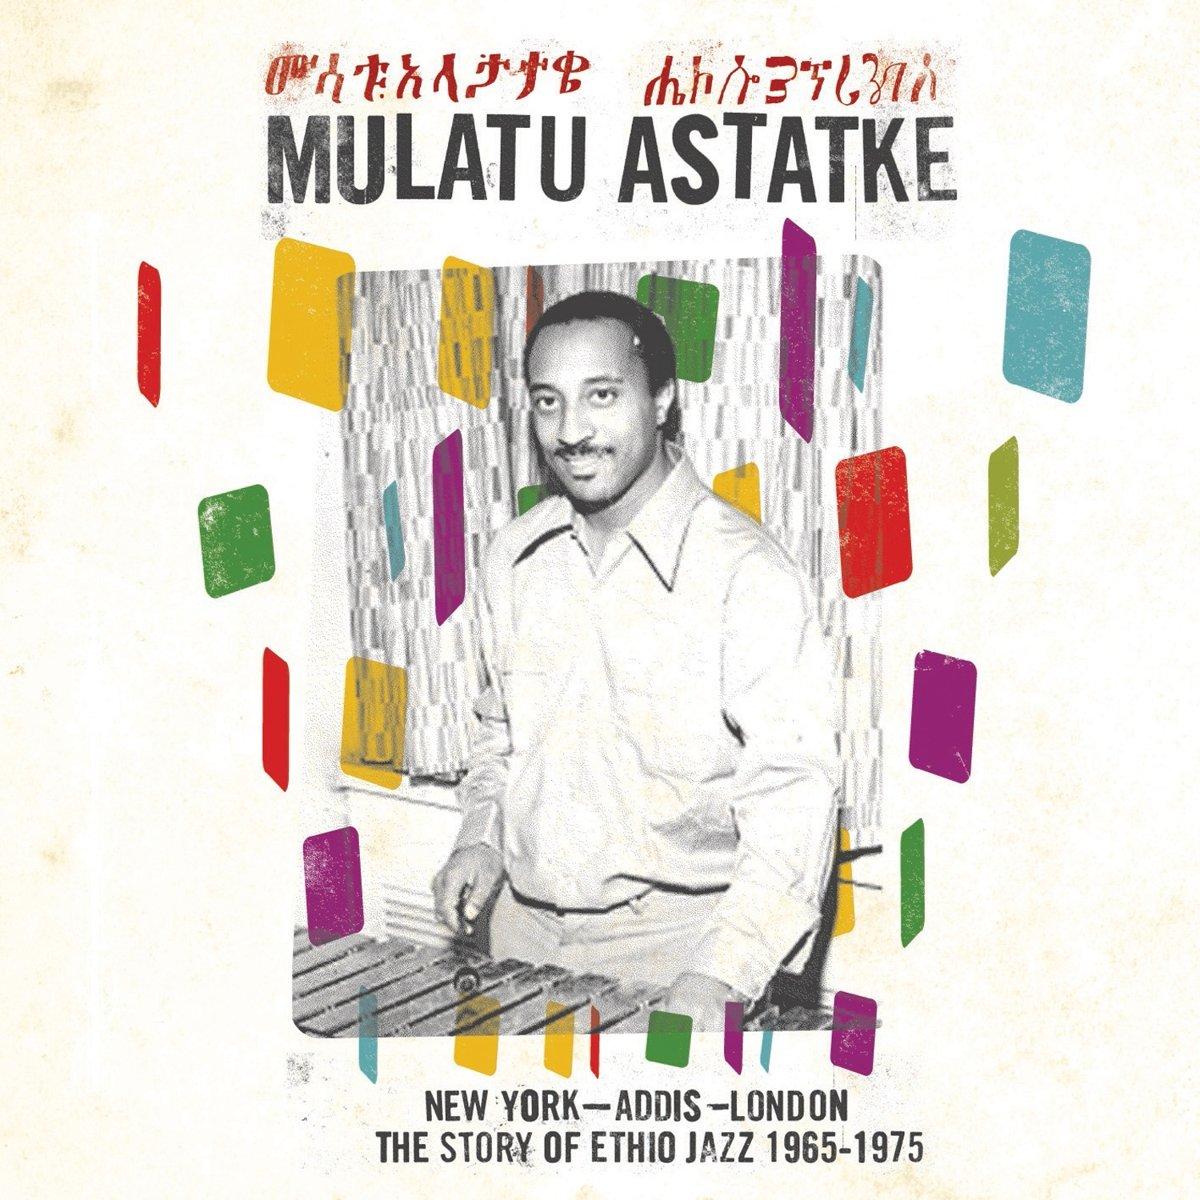 From New York City to Addis Ababa: The Best of Mulatu Astatke [Vinyl]